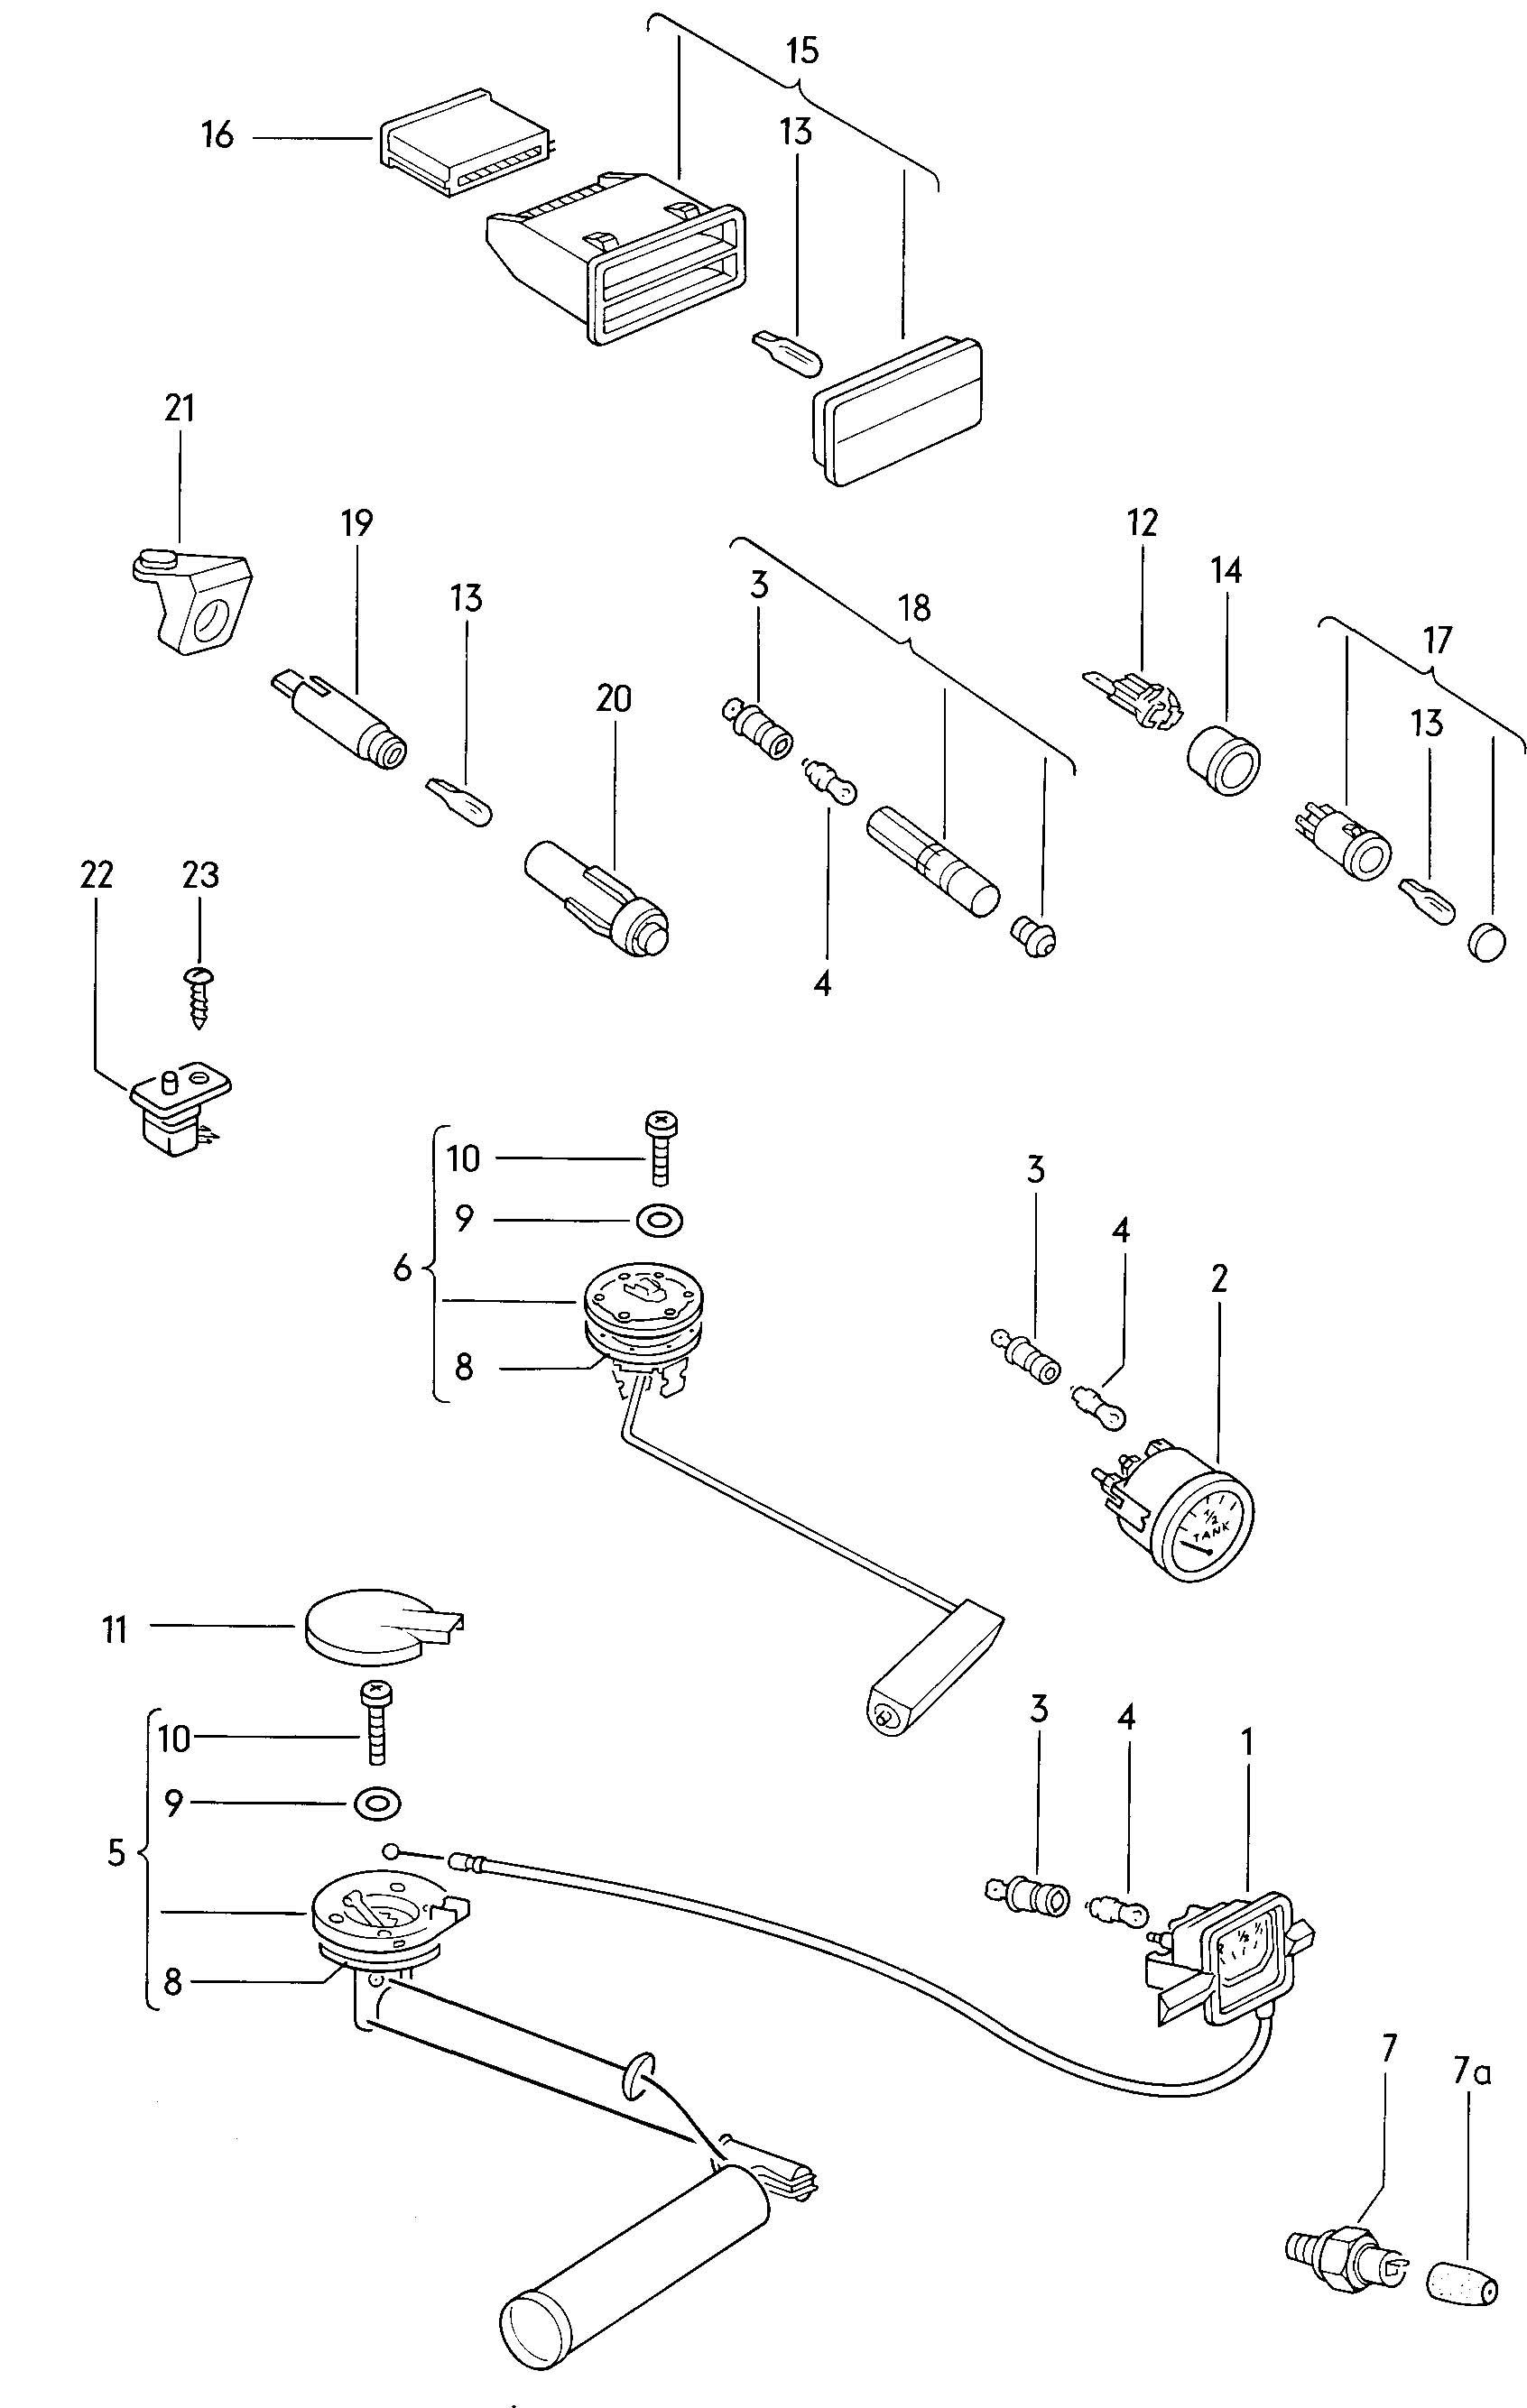 Volkswagen Beetle Fuel Gauge Sender Oil Pressure Switch Warning Light For Dual Circuit Brake